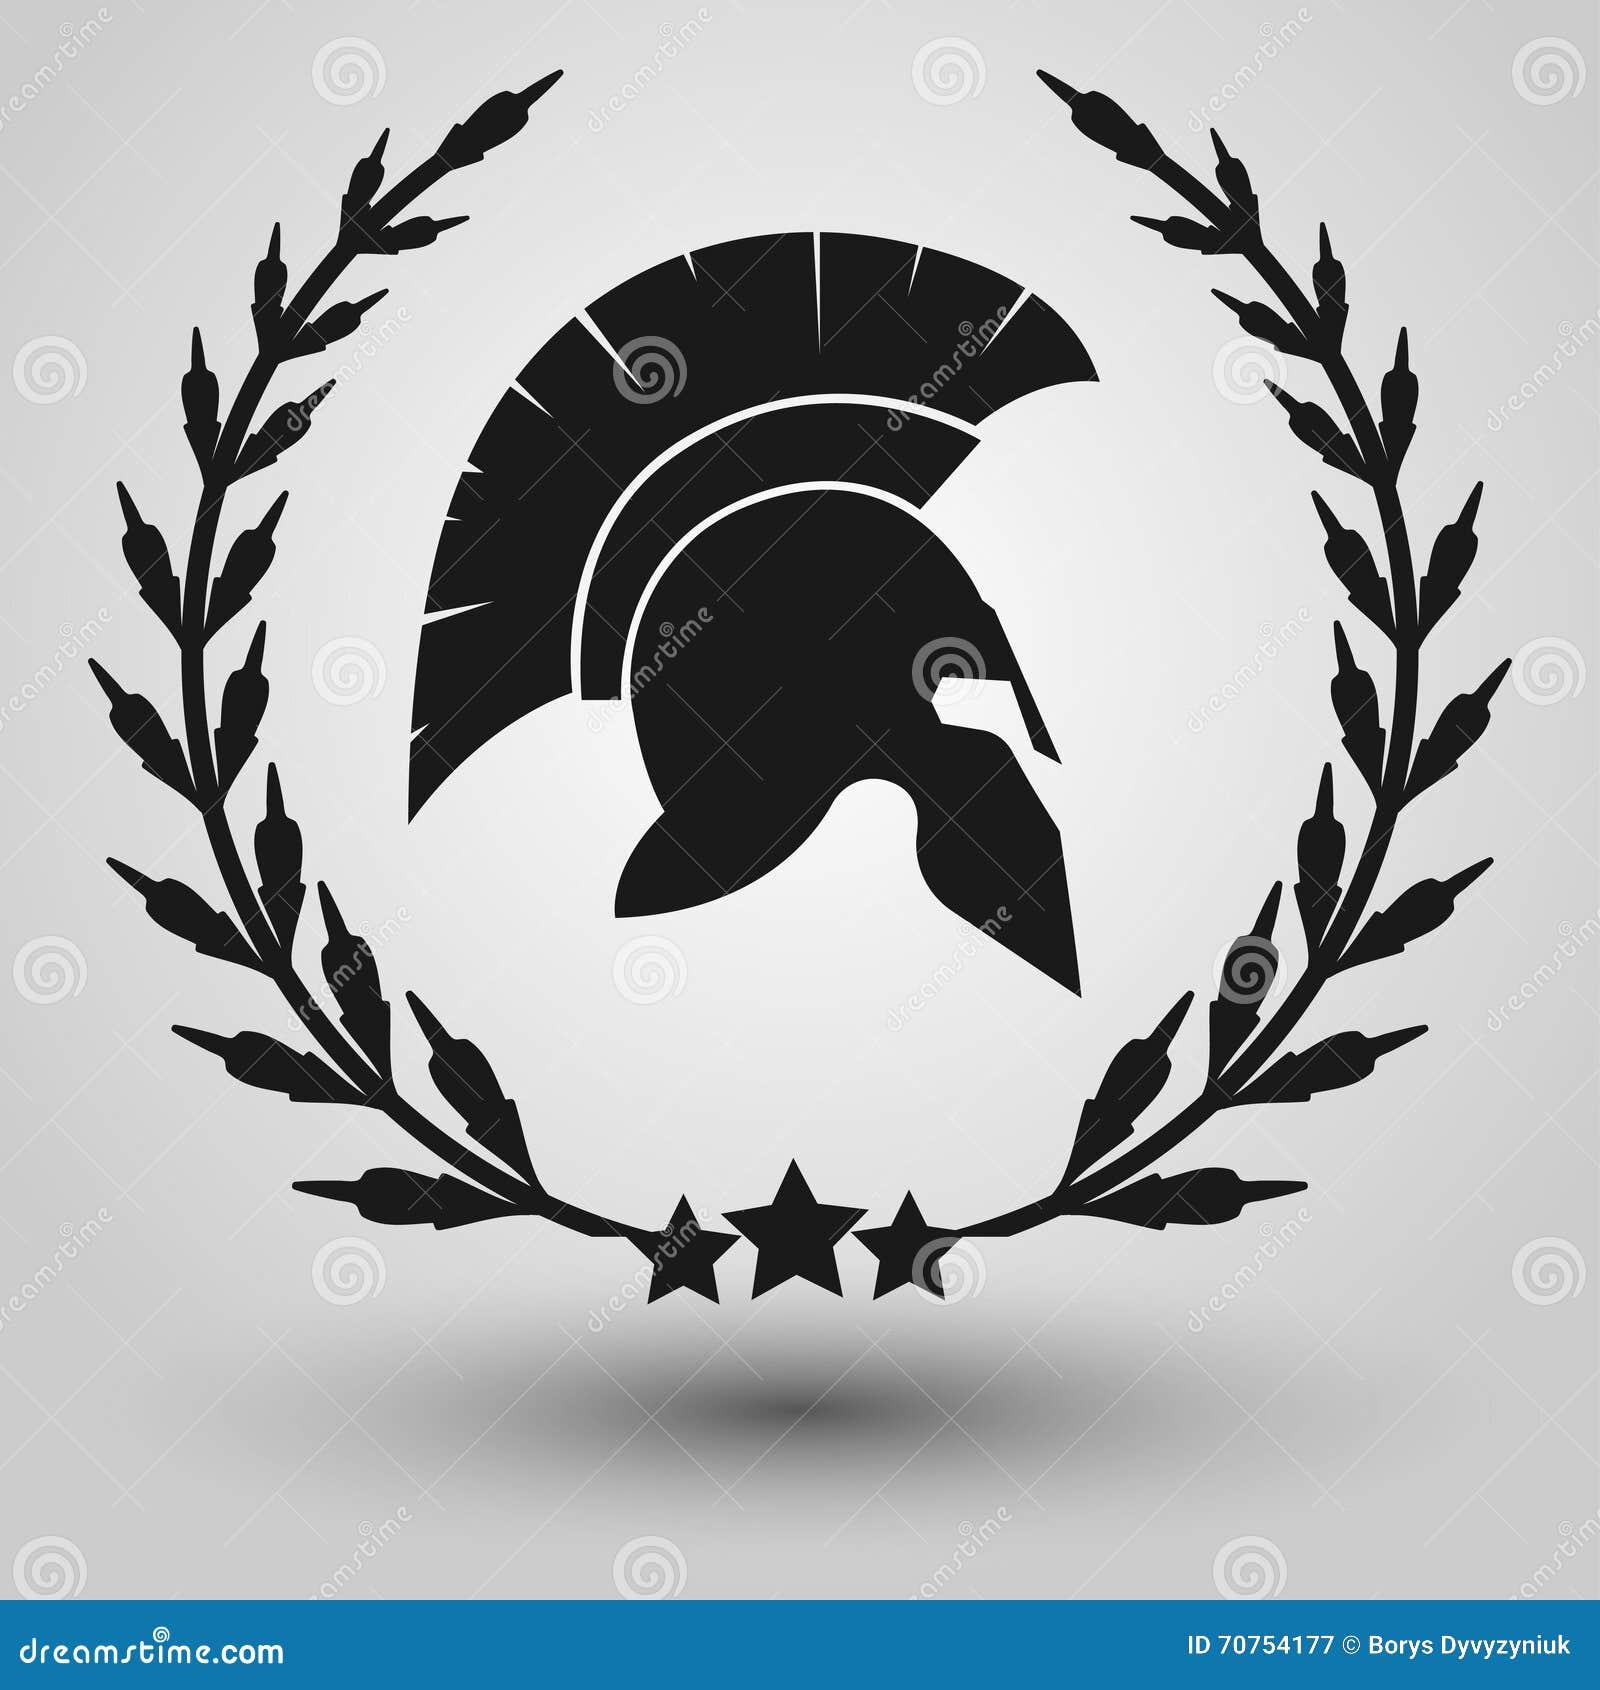 Spartan helmet silhouette stock illustration illustration of spartan helmet silhouette biocorpaavc Gallery